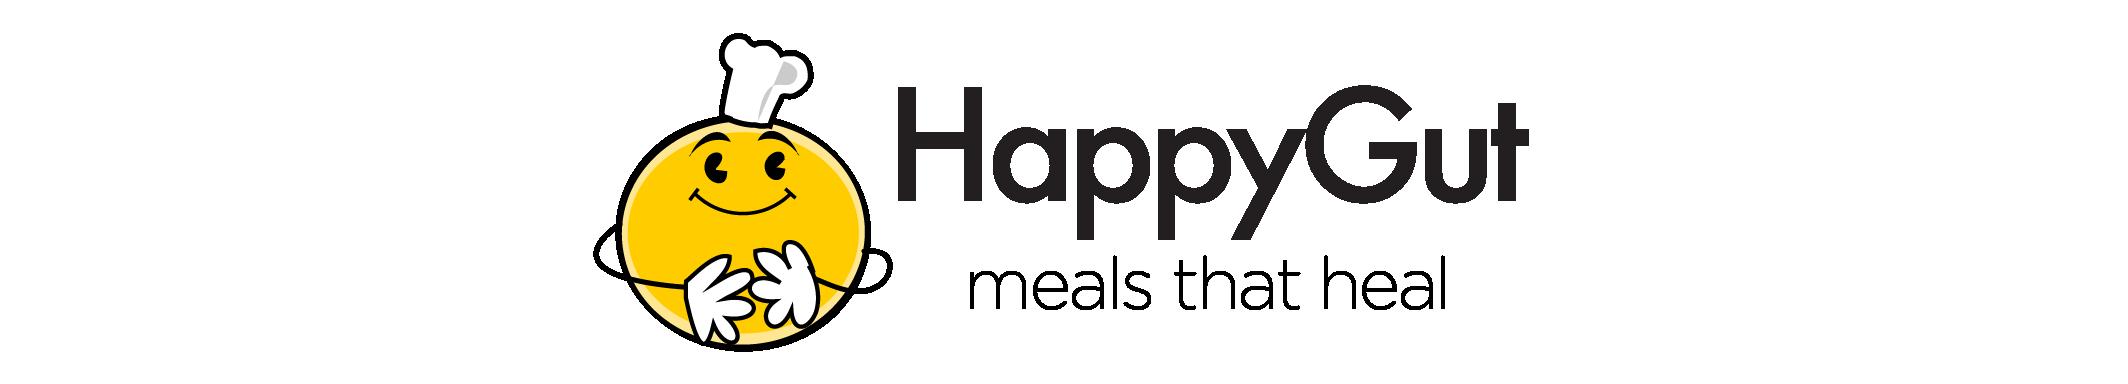 HappyGut